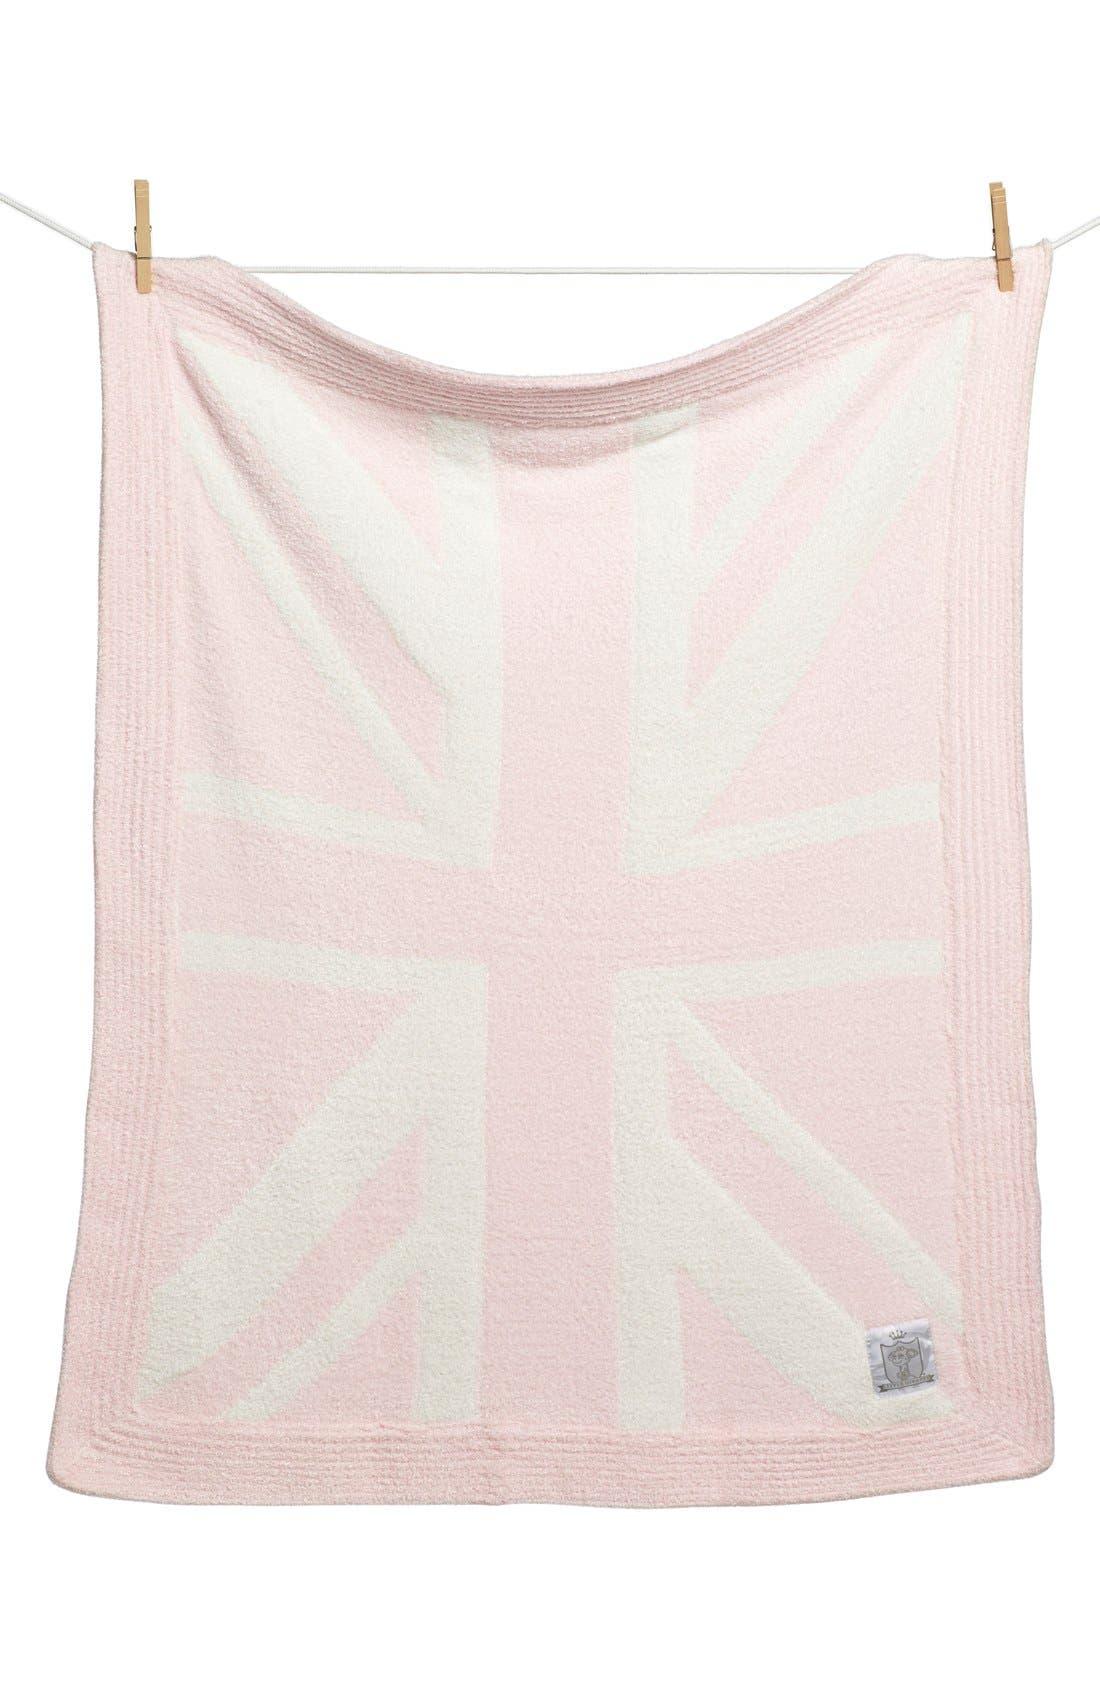 'Dolce Union Jack' Blanket,                             Main thumbnail 1, color,                             Pink